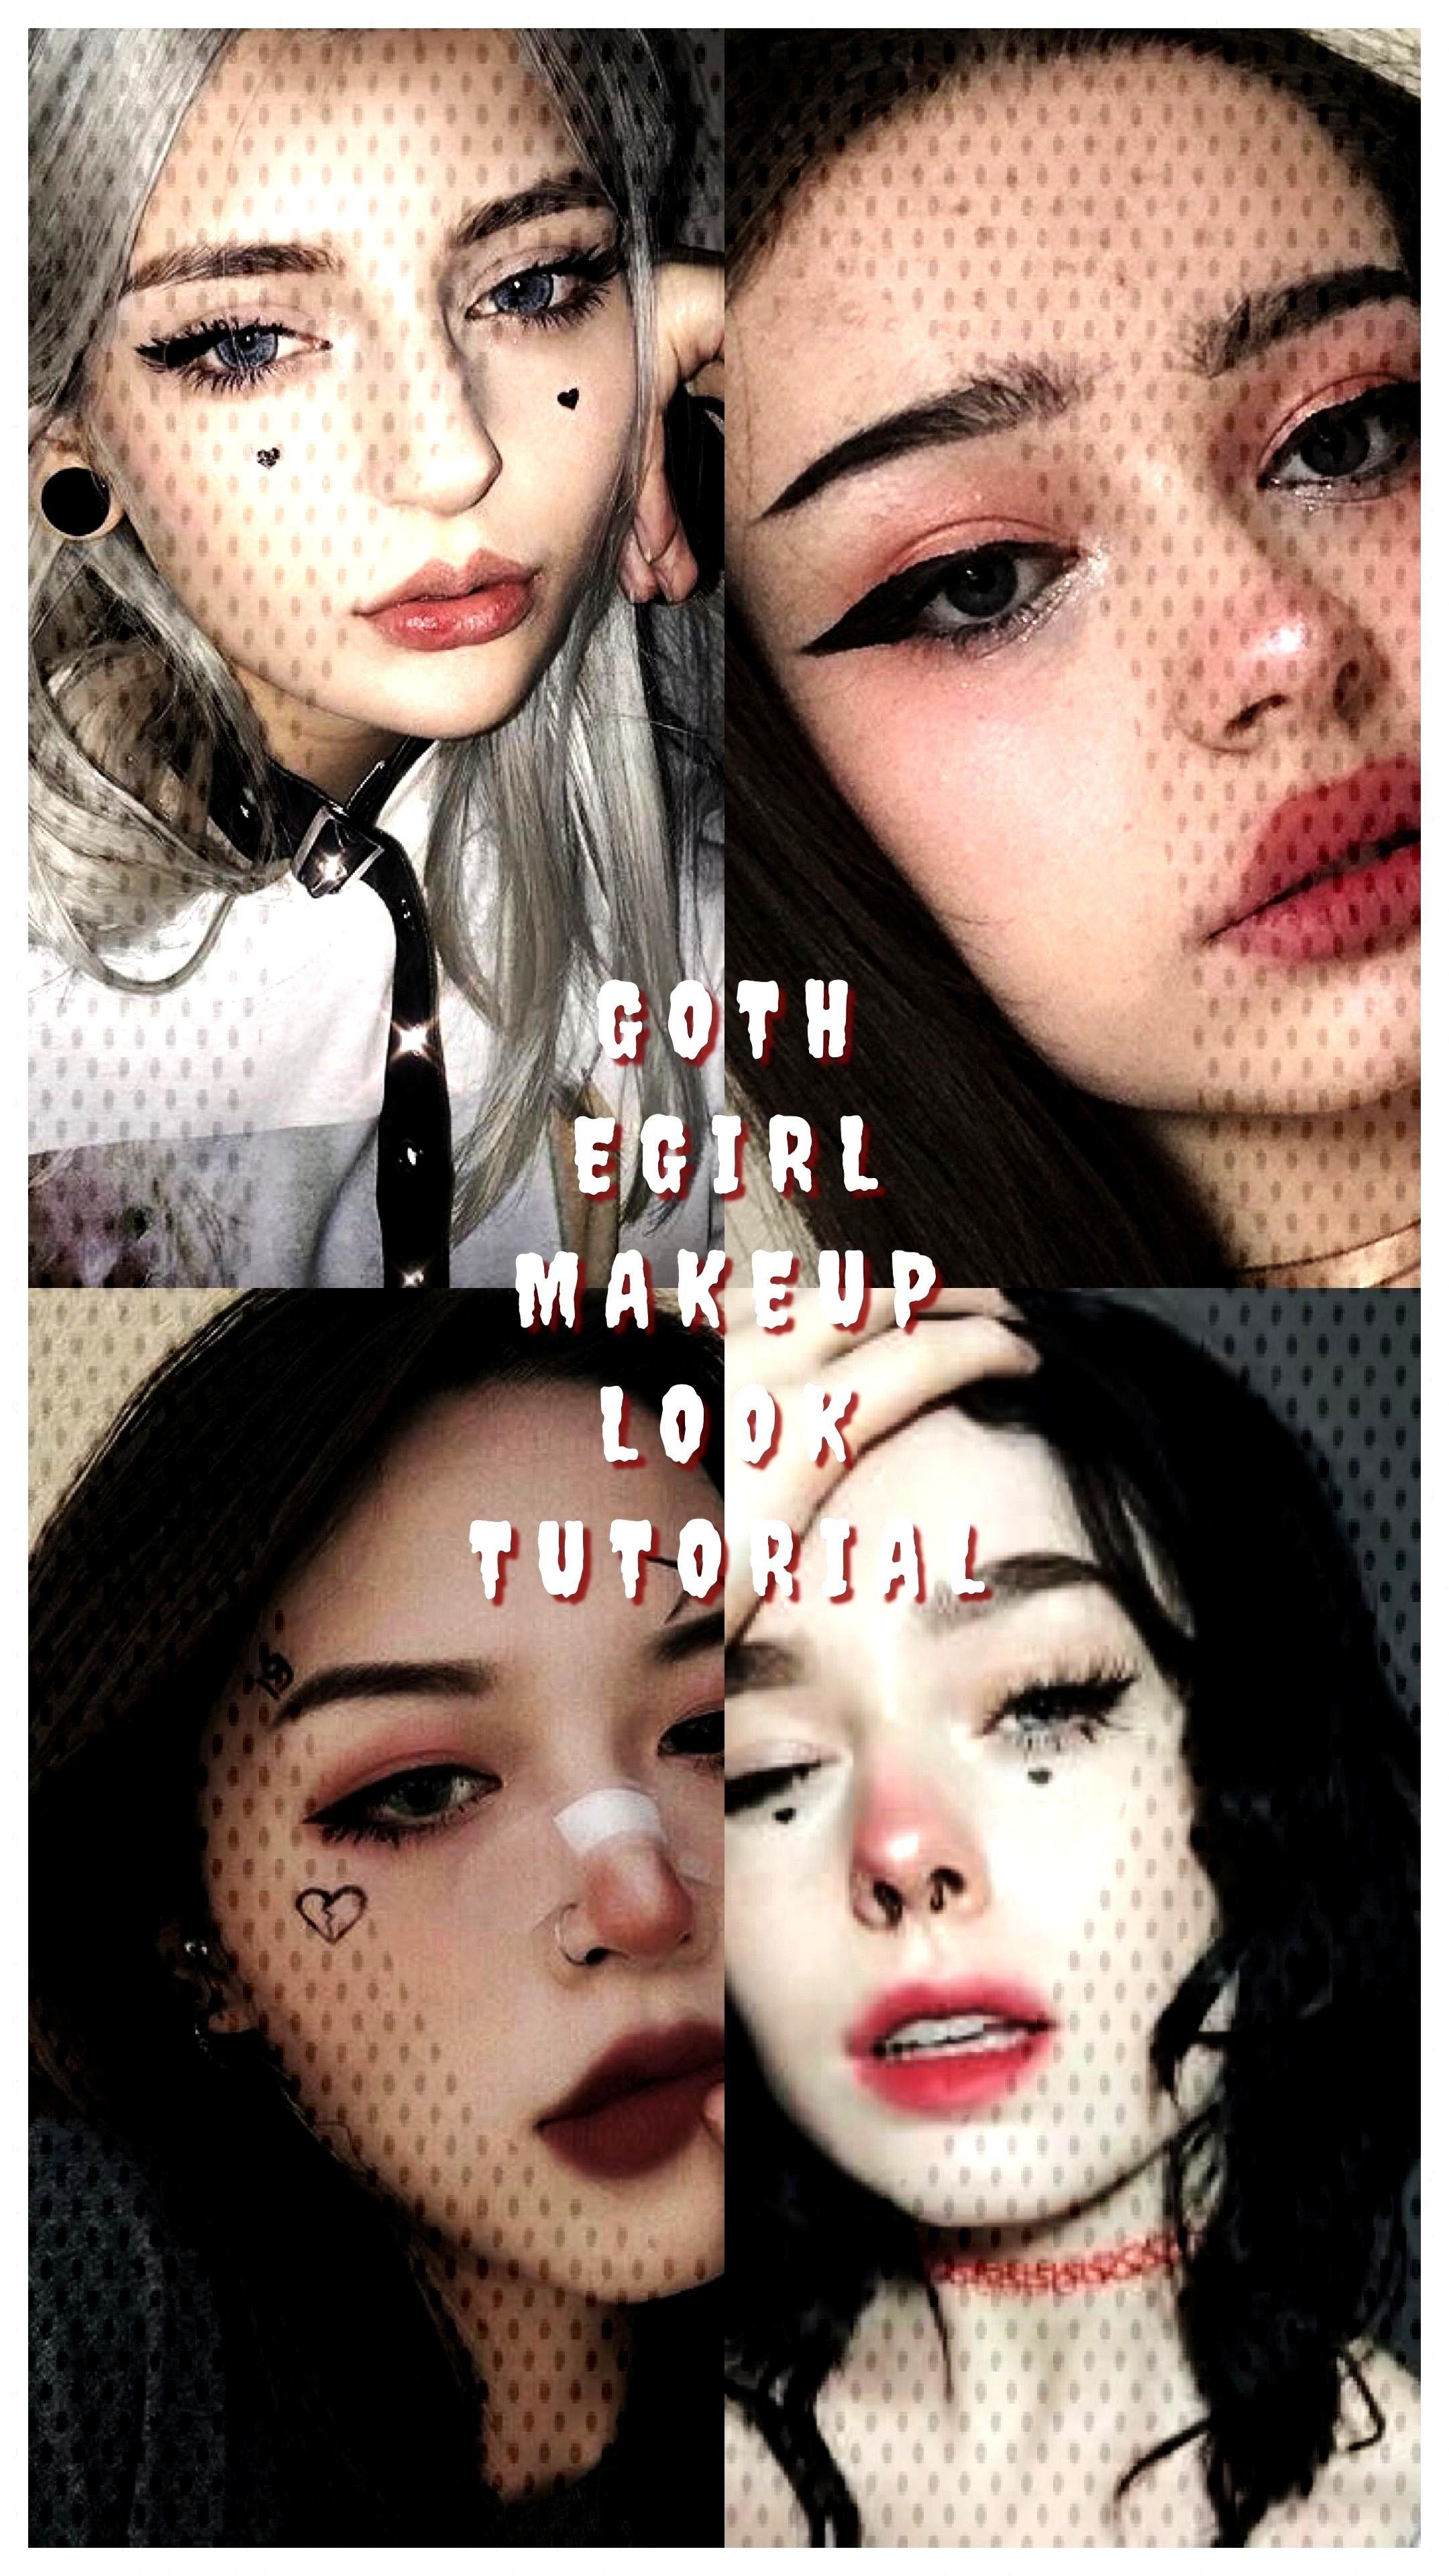 Tutorial Makeup Egirl Goth Girl Look Easy Eye E Egirl Makeup Goth E Girl Makeup Look Easy Goth Goth Eye Makeup Goth Makeup Tutorial Cool Makeup Looks